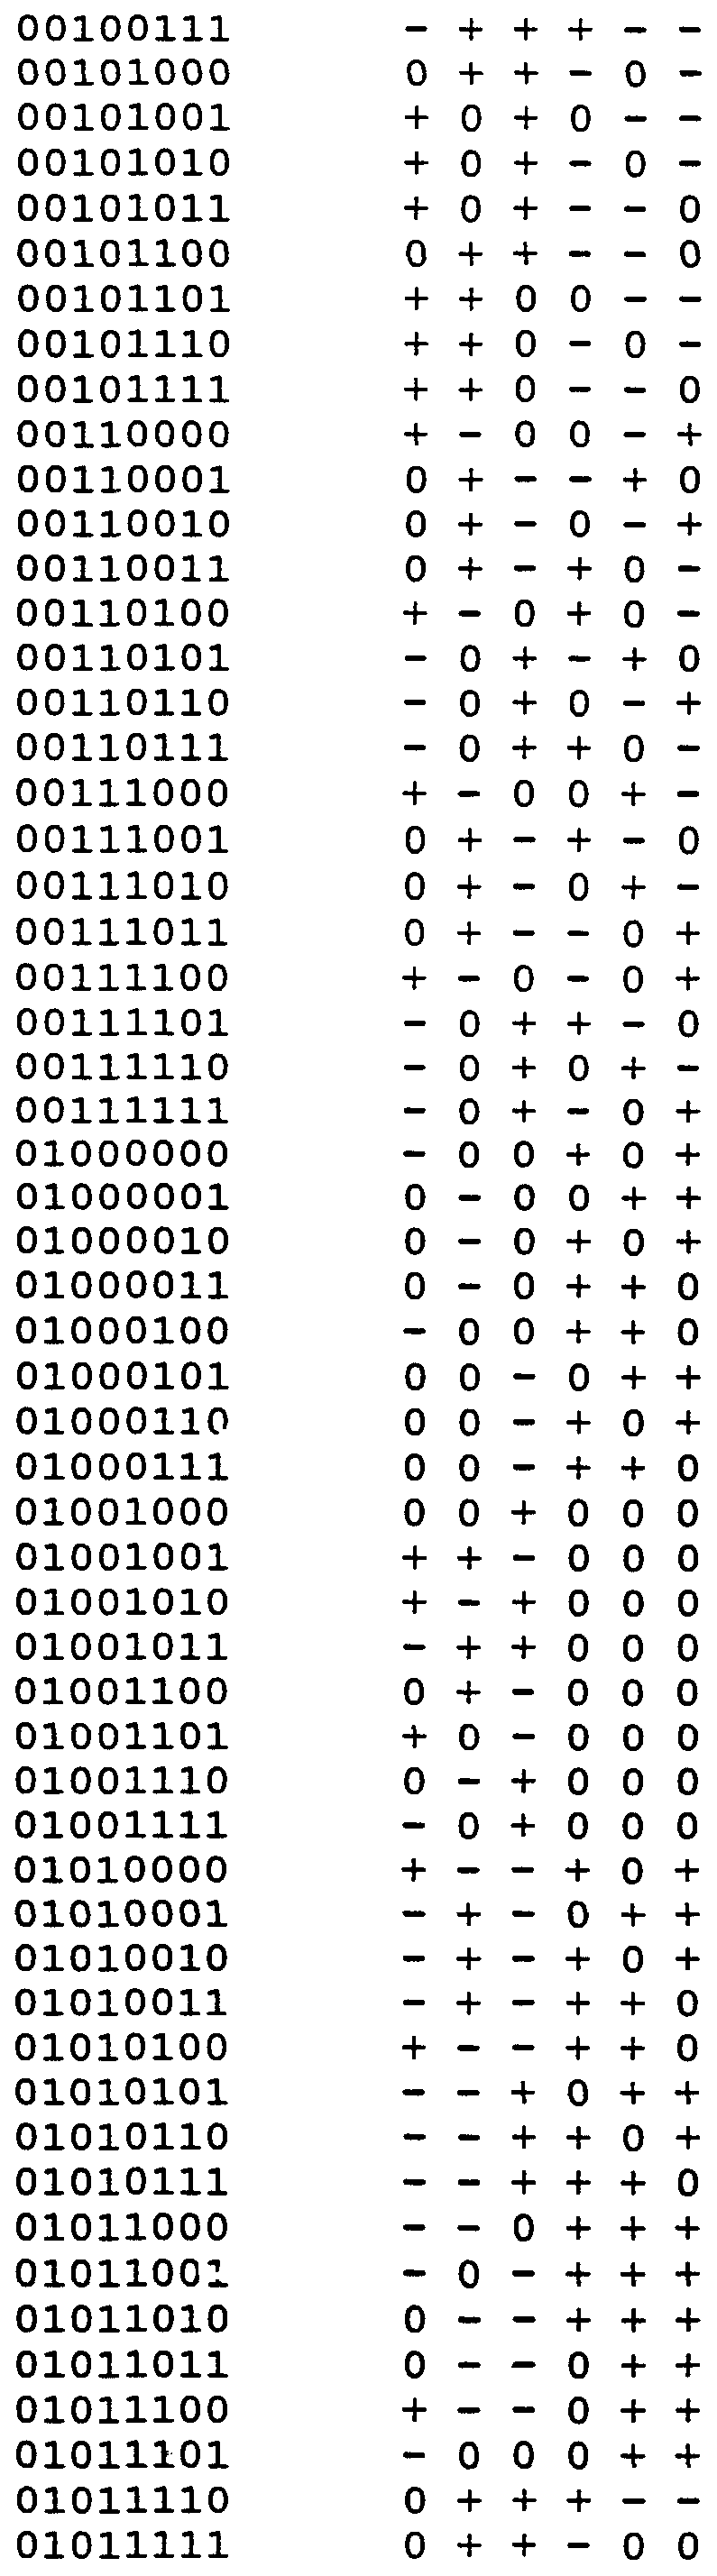 12 Bit Level Translator For Digital Circuitry